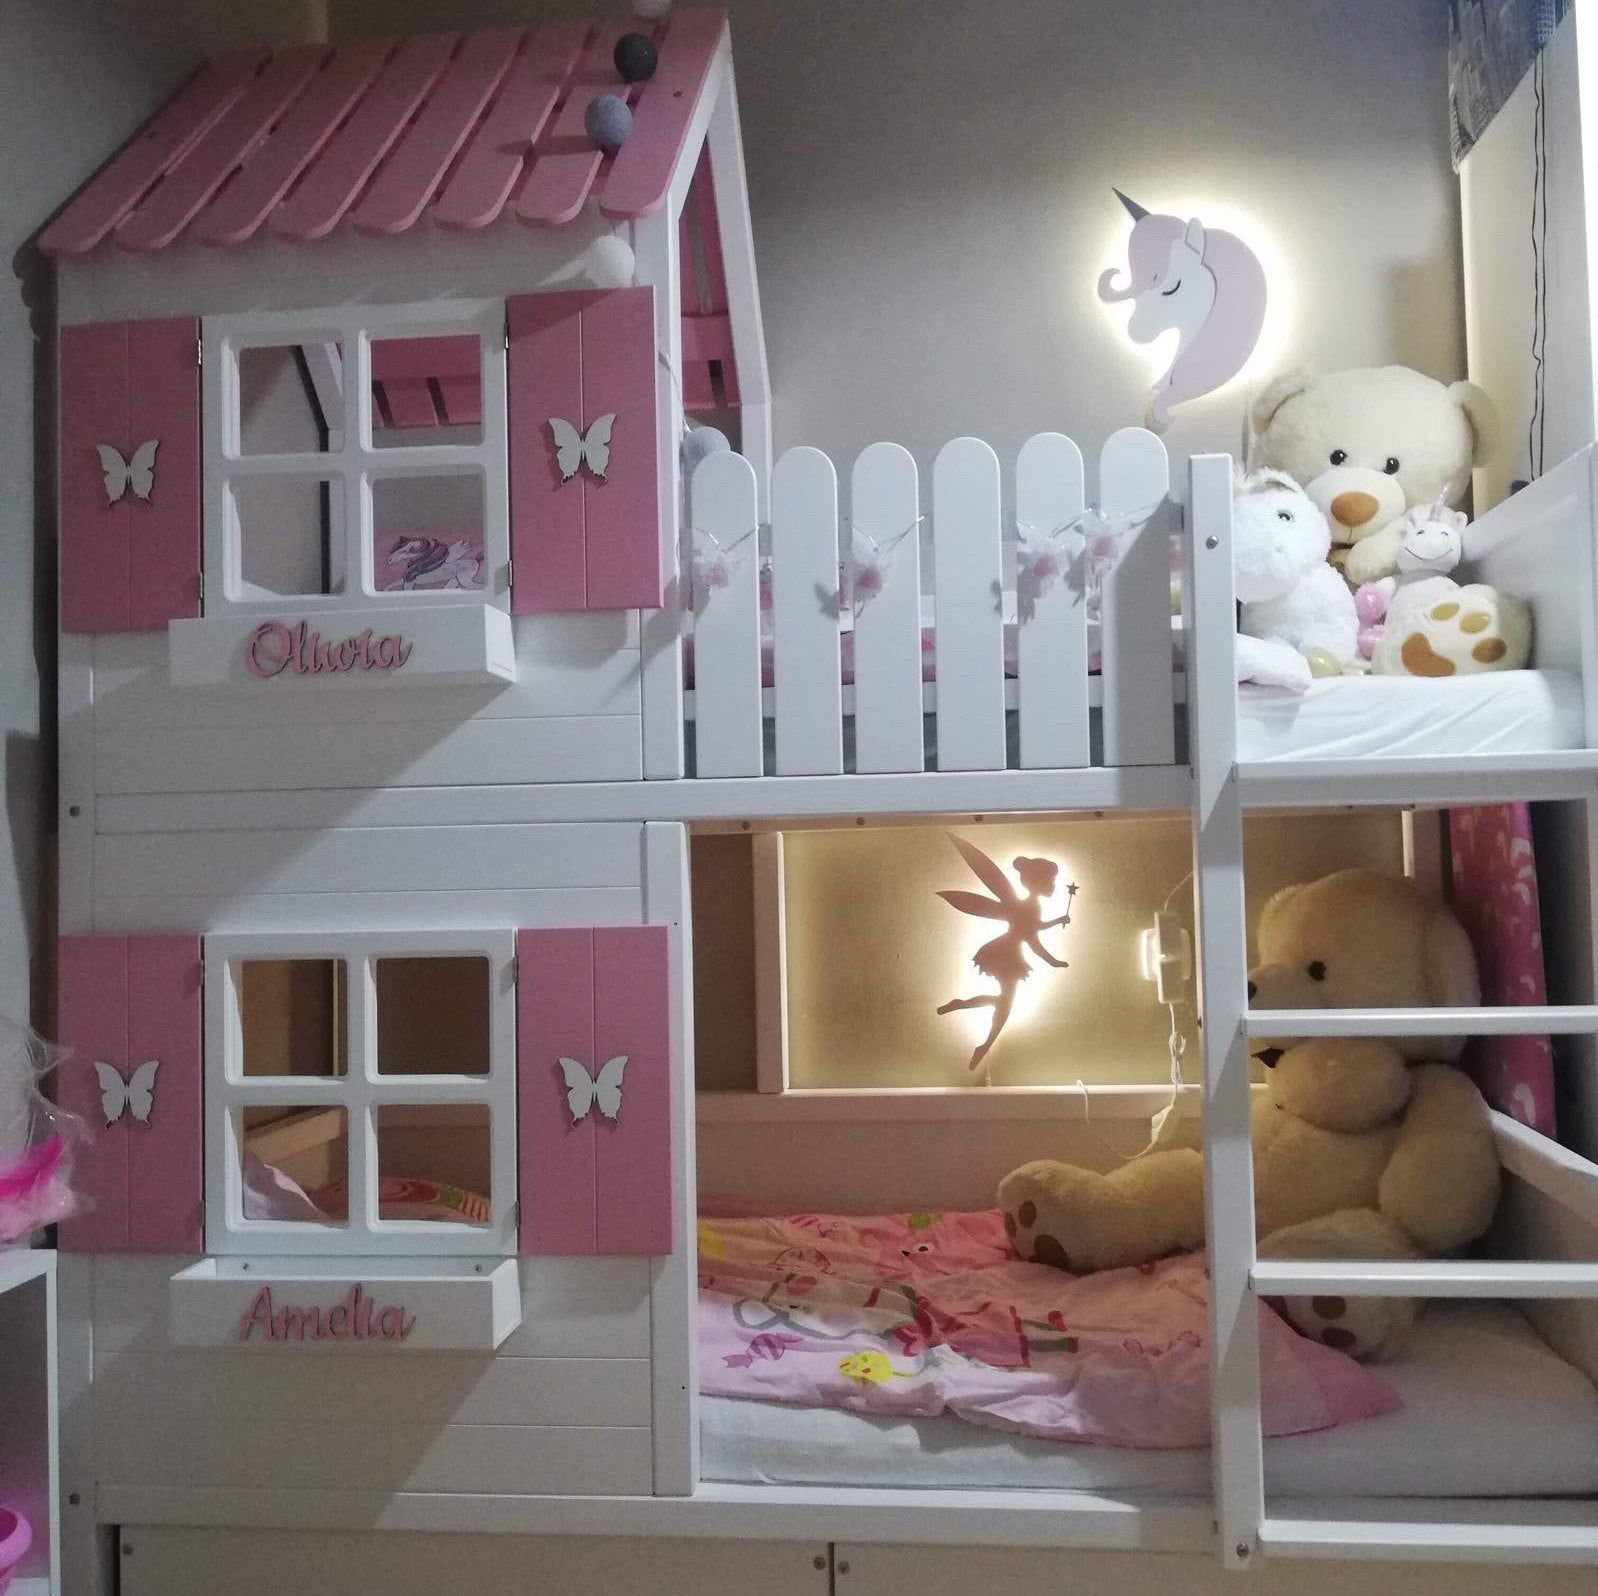 Bunkbed Hausbett Lozkodomek Dreambeds Kinderbett Jugendbett Etsy Kid Beds Dreams Beds Bed